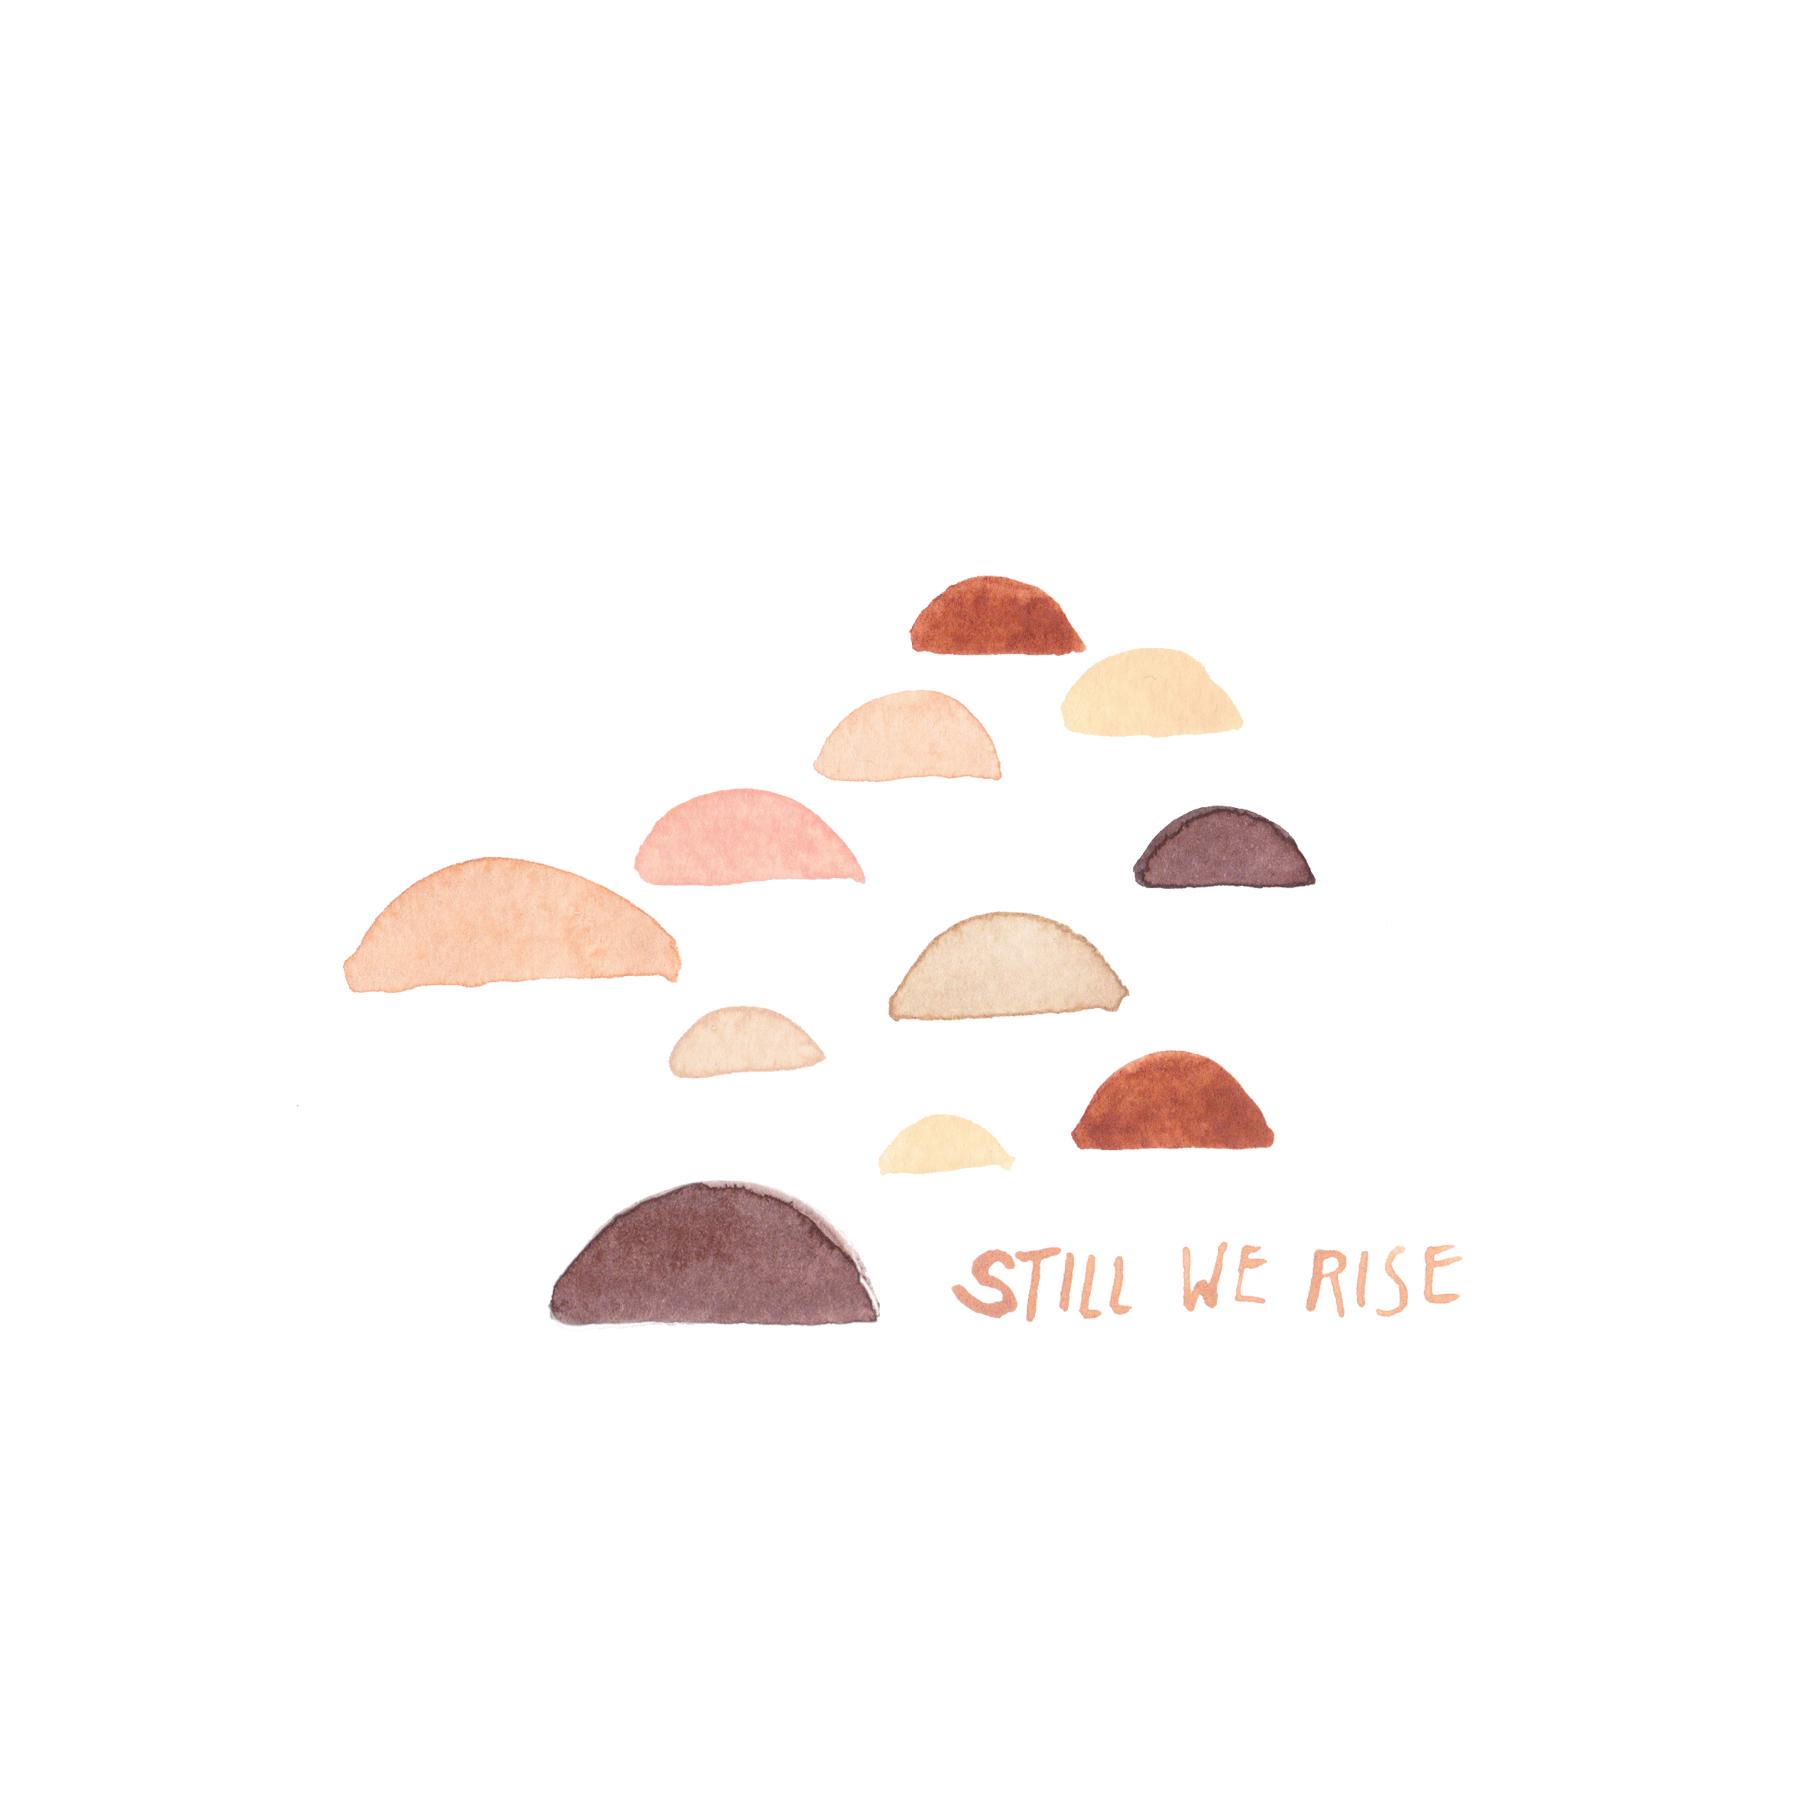 still we rise #4 by joya logue